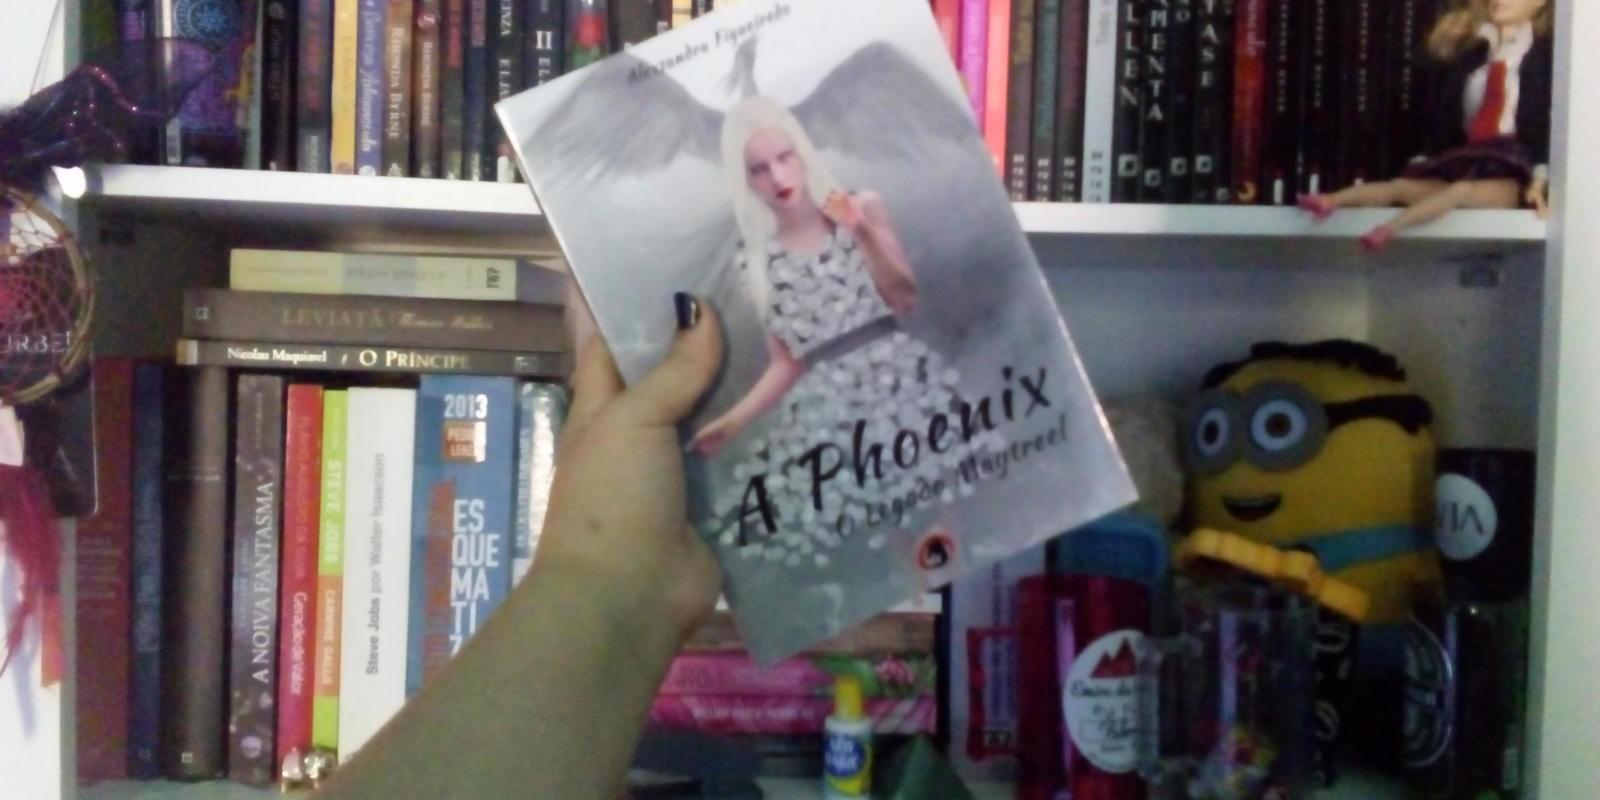 [A Phoenix (O Legado Maytreel) - Alexsandra Figueiredo.]